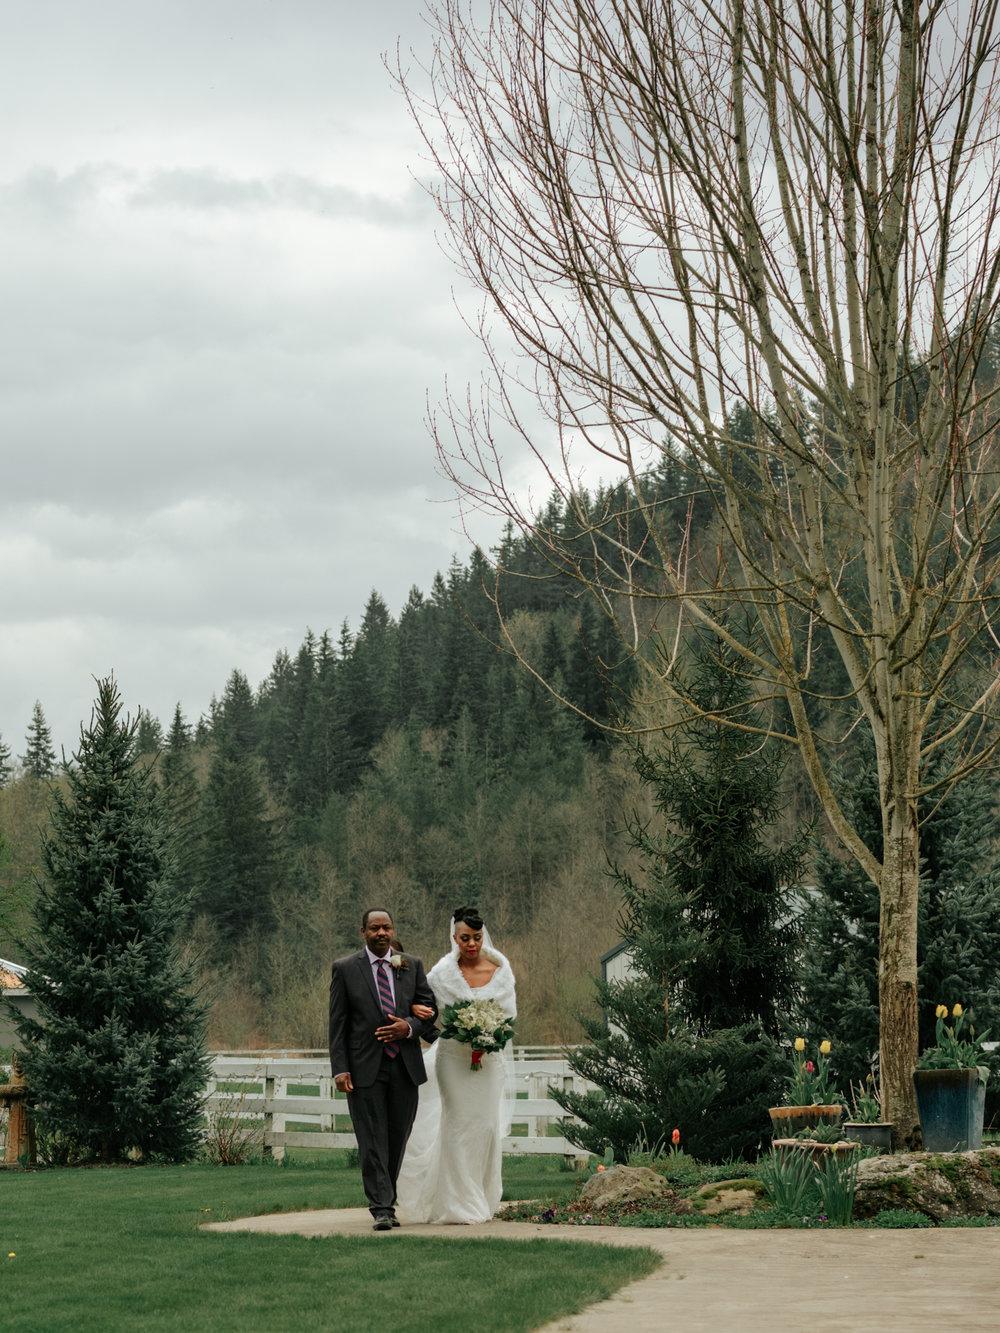 Stolen Glimpses Seattle Wedding Photographer at Rein Fire Ranch 57.jpg